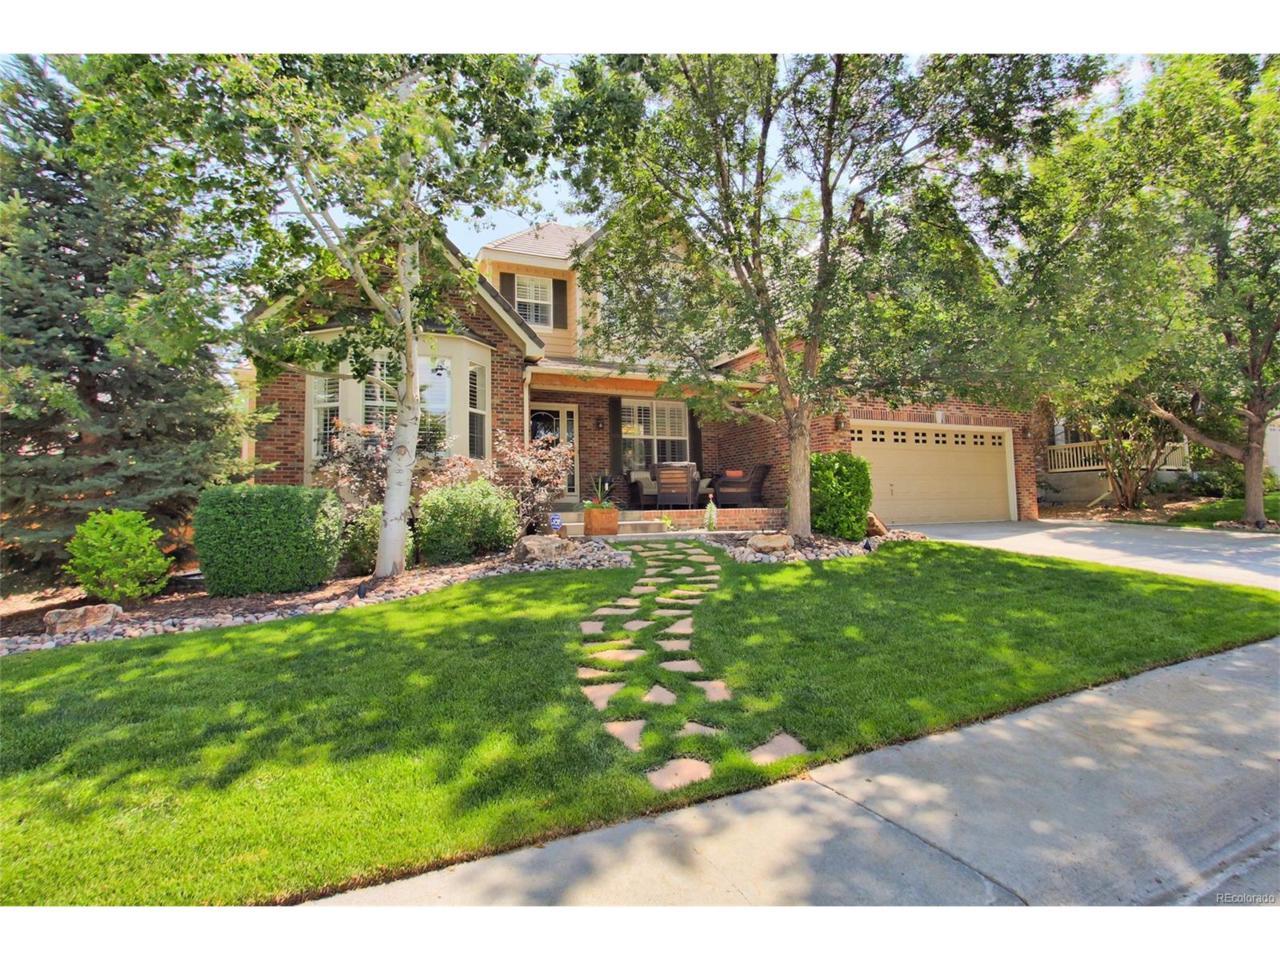 13726 St Paul Street, Thornton, CO 80602 (MLS #8484522) :: 8z Real Estate